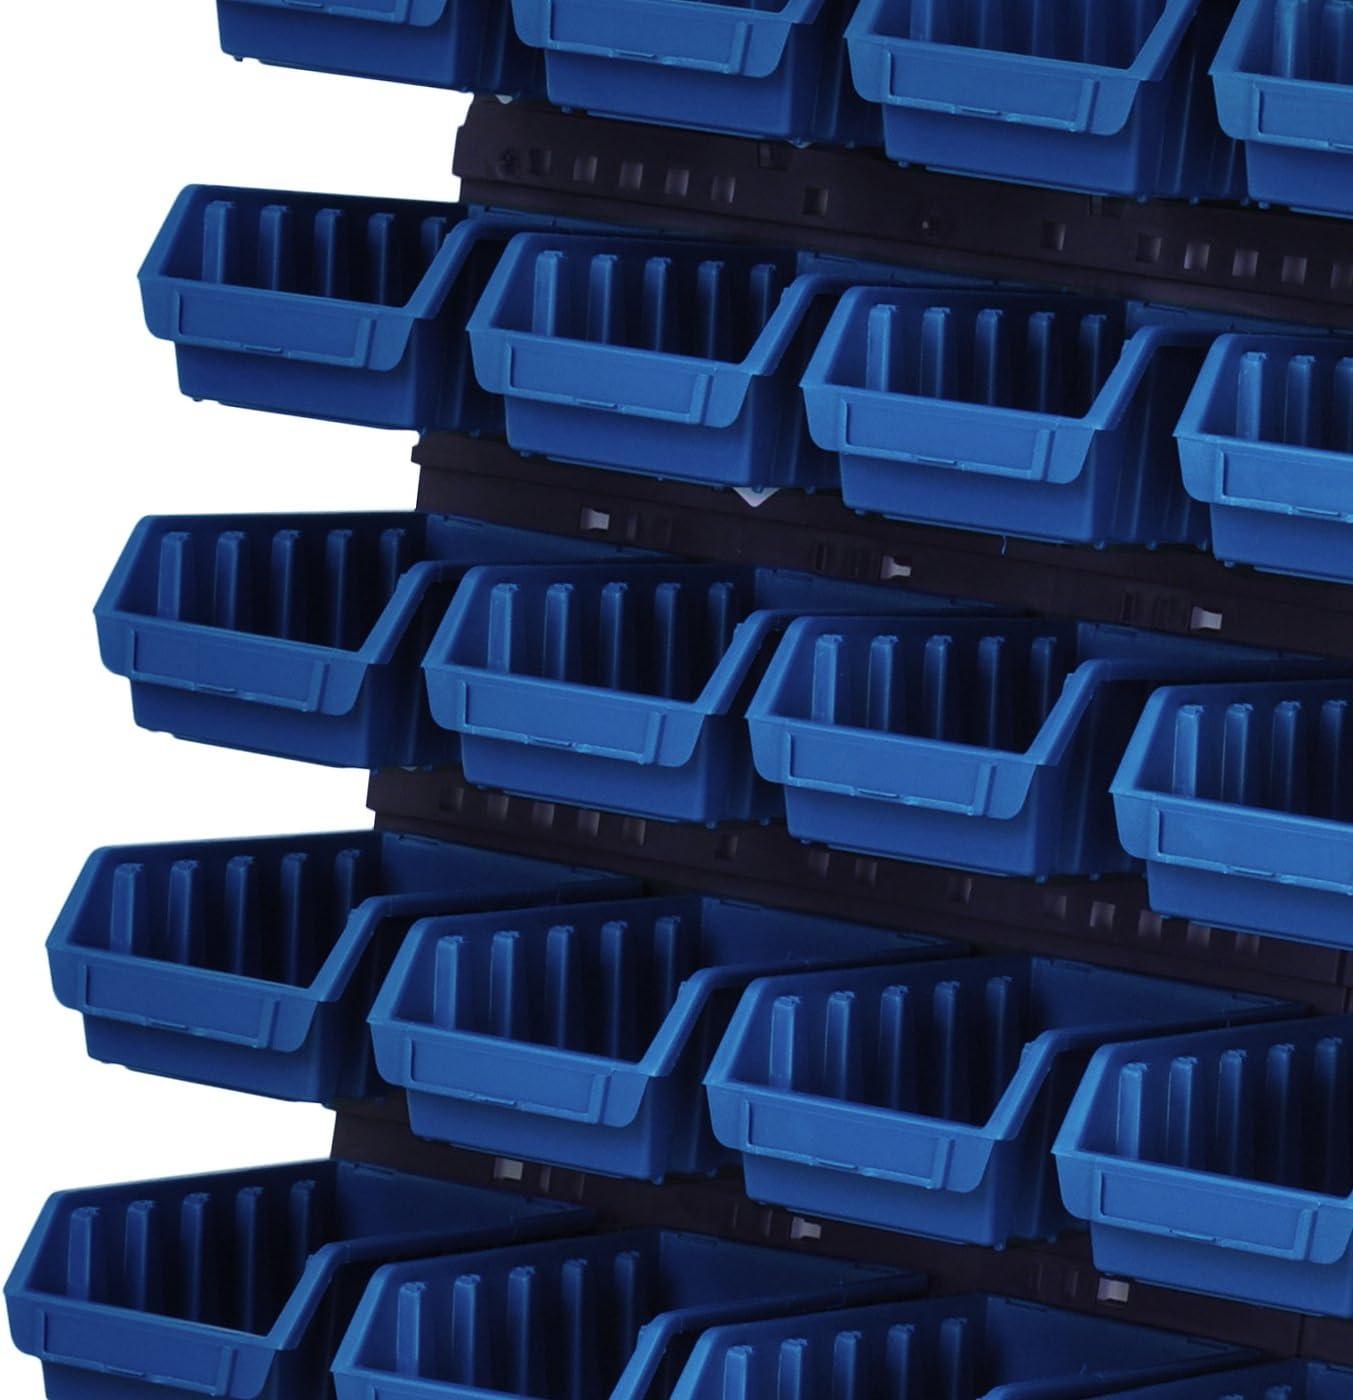 63 K/üvetten 117 x 210 x 75 mm Rot Wandregal Lagerregal Werkzeugwand Stapelboxen Wandpaneel Werkstatt Lager